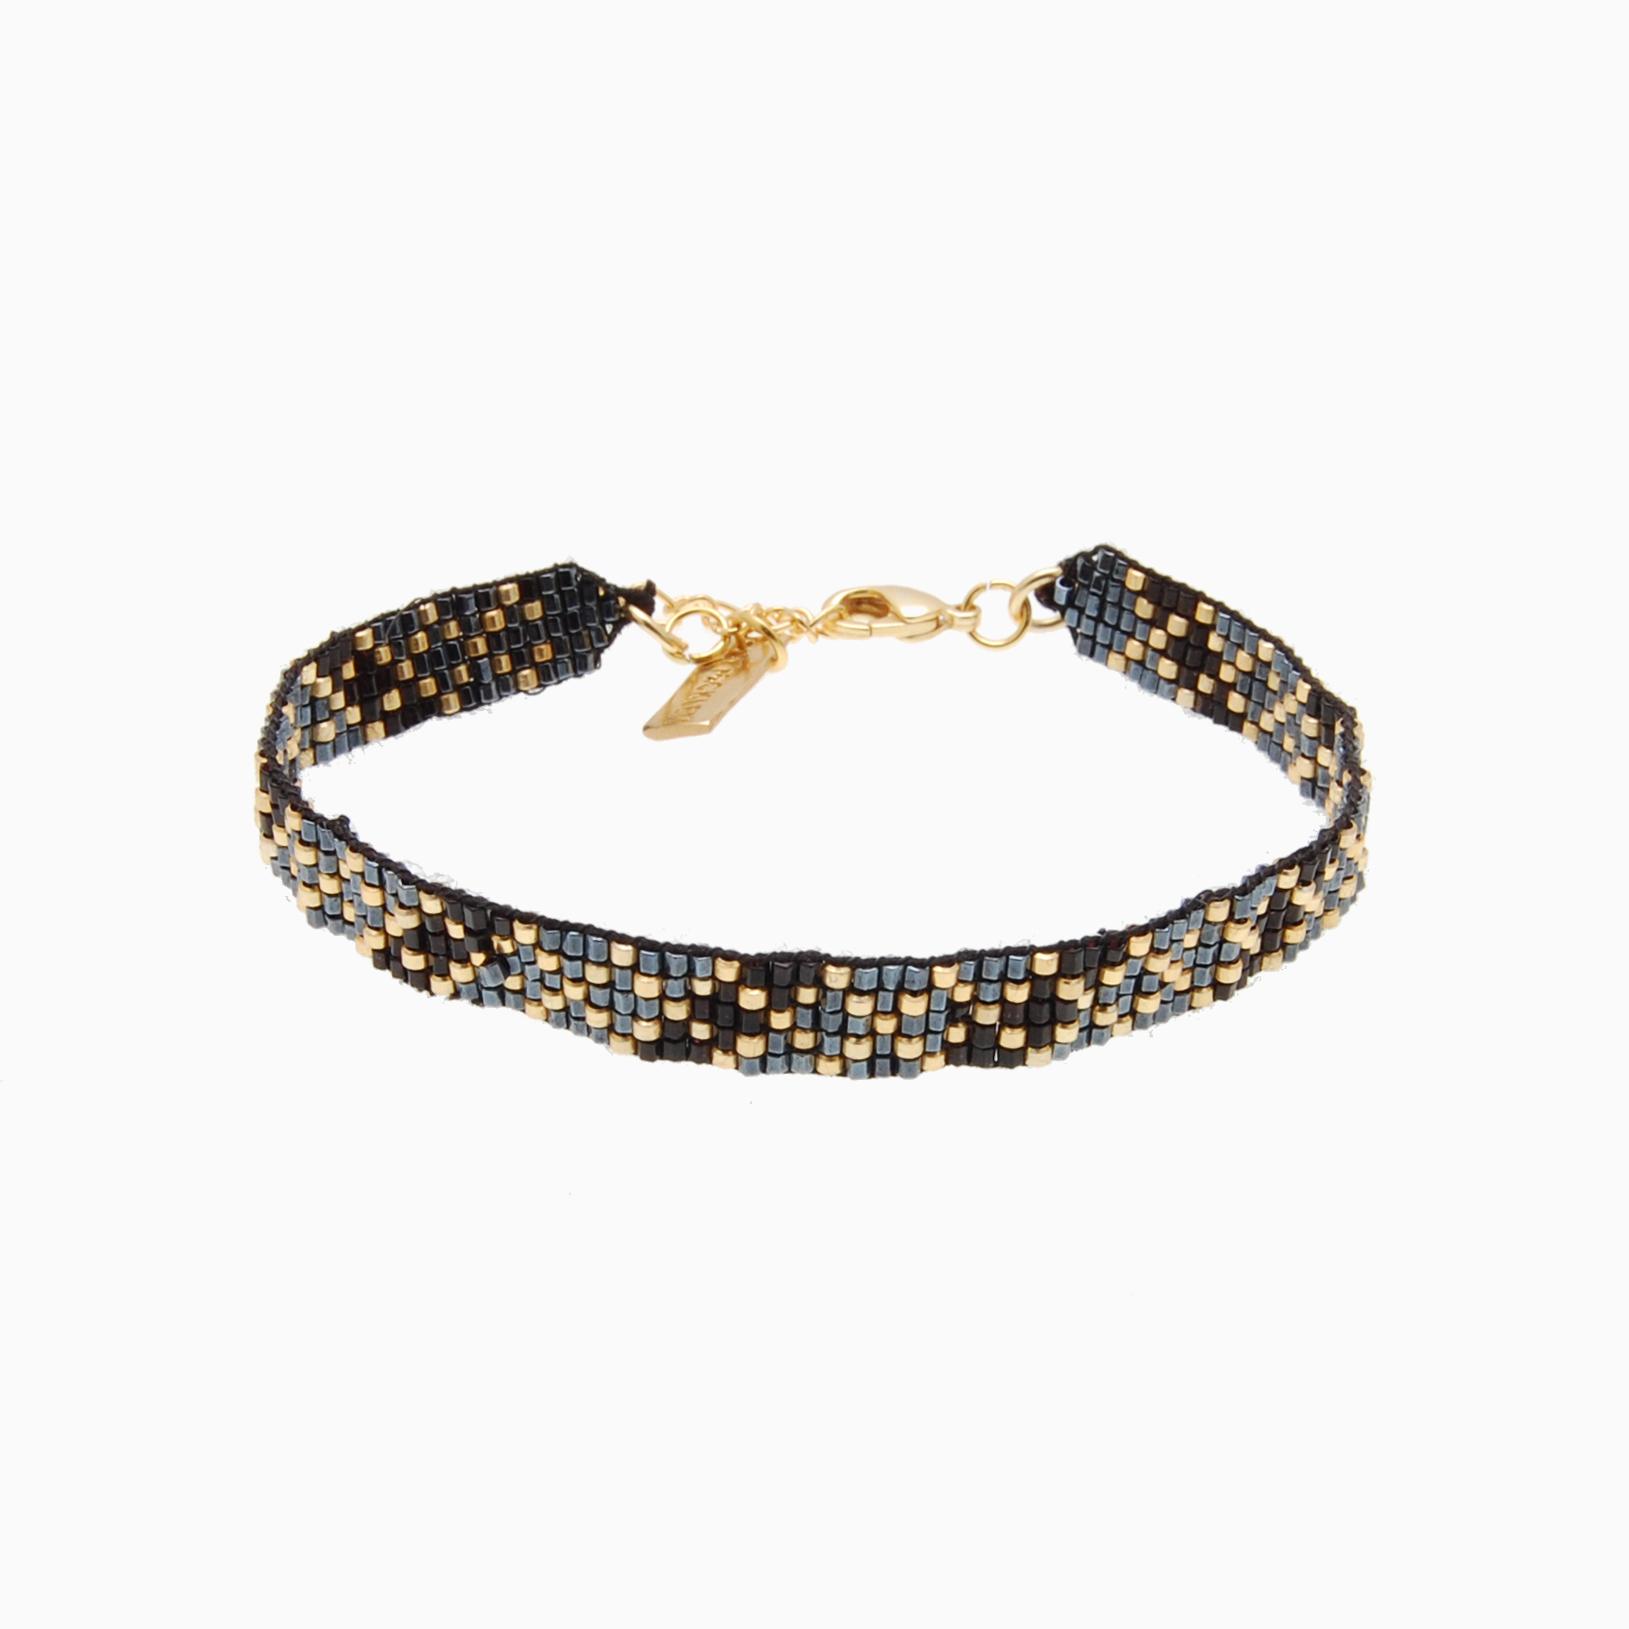 Vævet armbånd med perler, sort/grå | no. 106